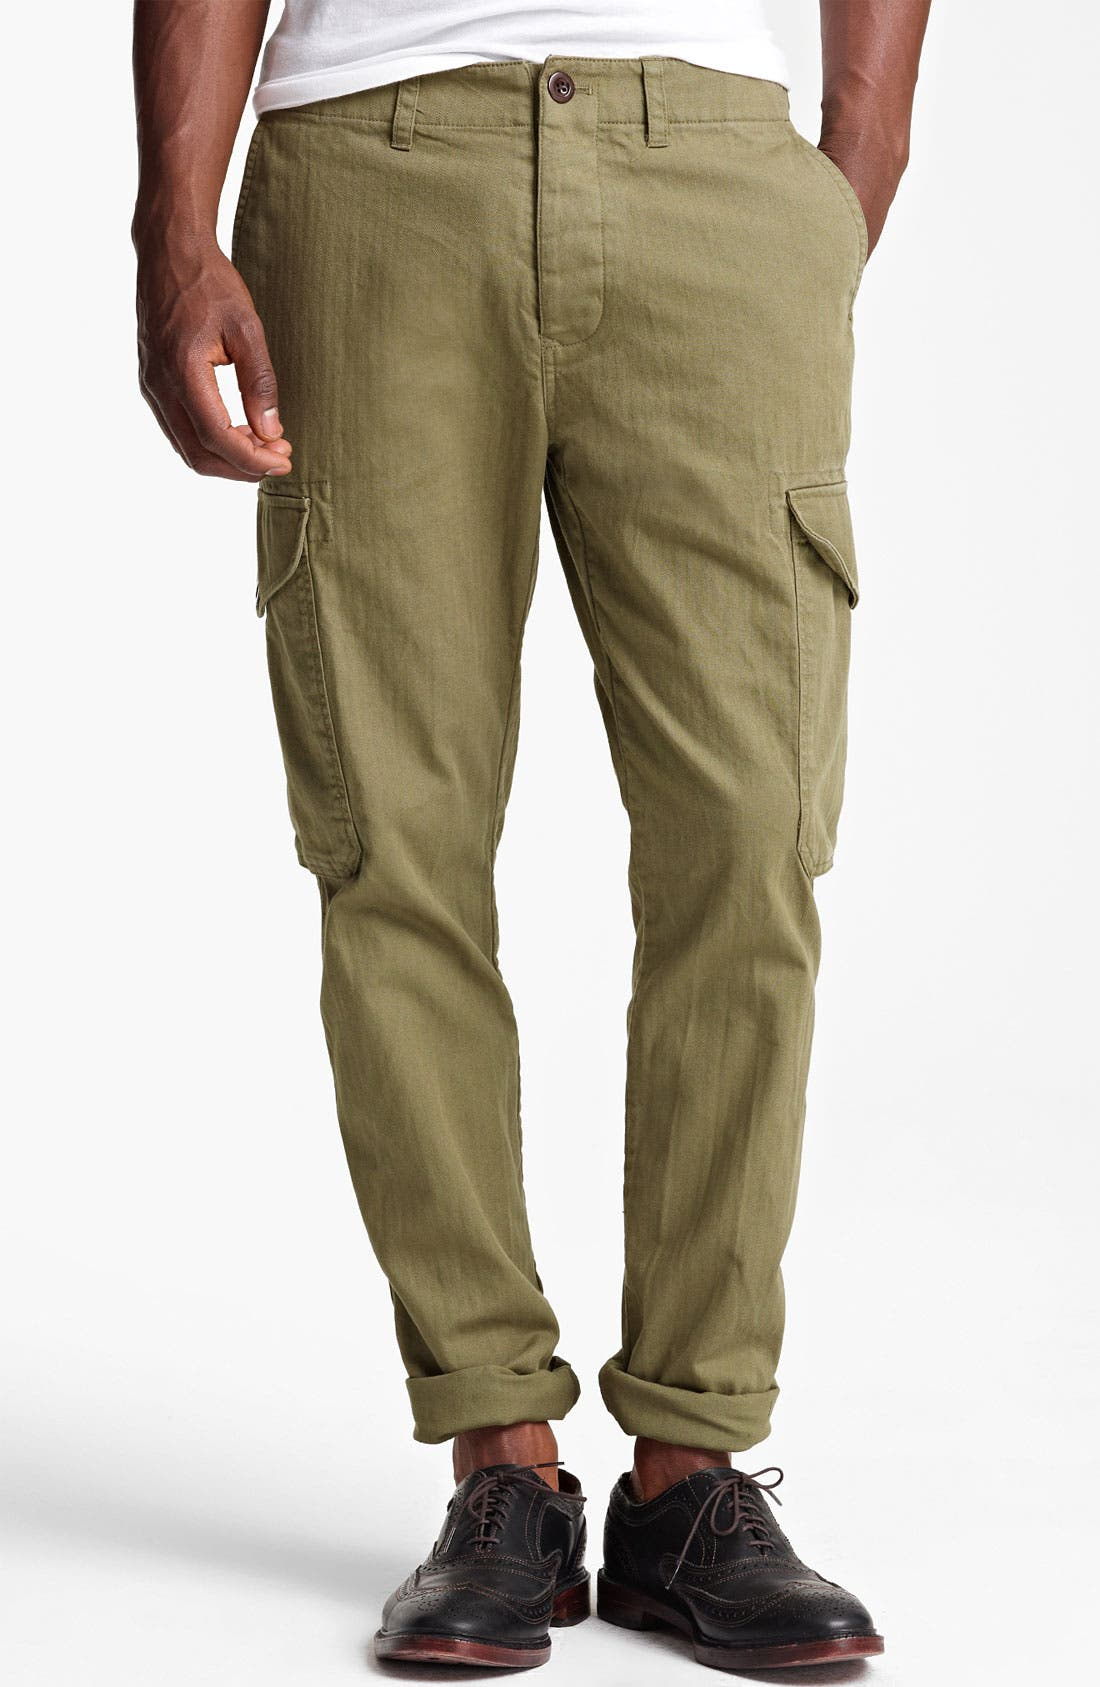 Alternate Image 1 Selected - Todd Snyder Slim Fit Infantry Pants